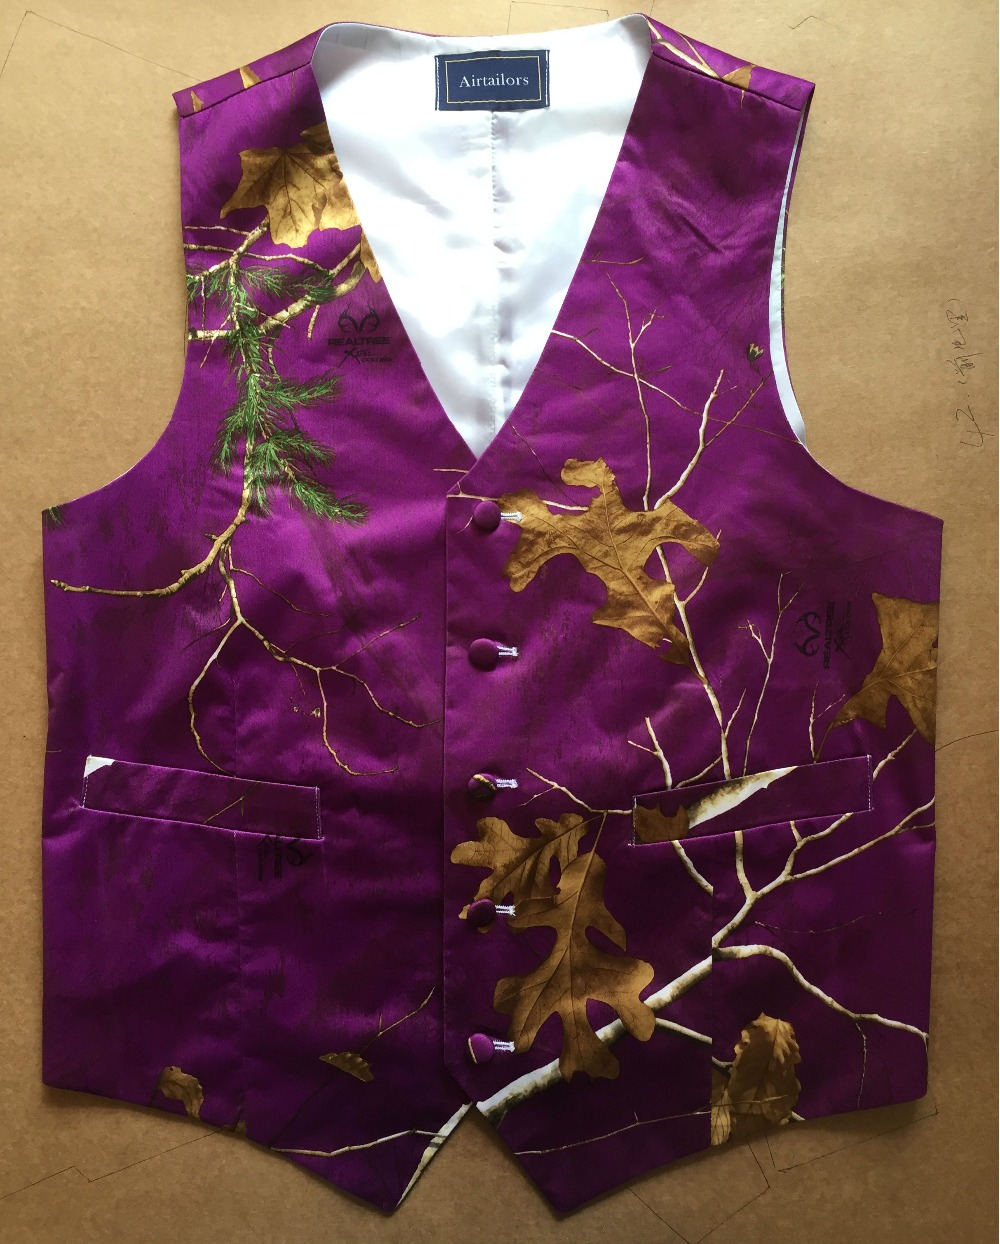 2019 Airtailors Designed Purple Realtree Camouflage Vest For Rustic Wedding Fashion Dress Vest